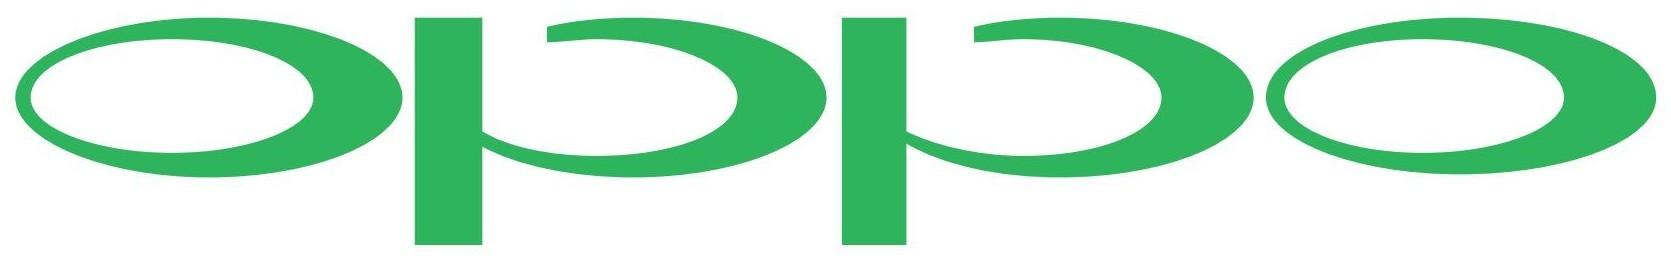 Oppo Logo [PDF] png